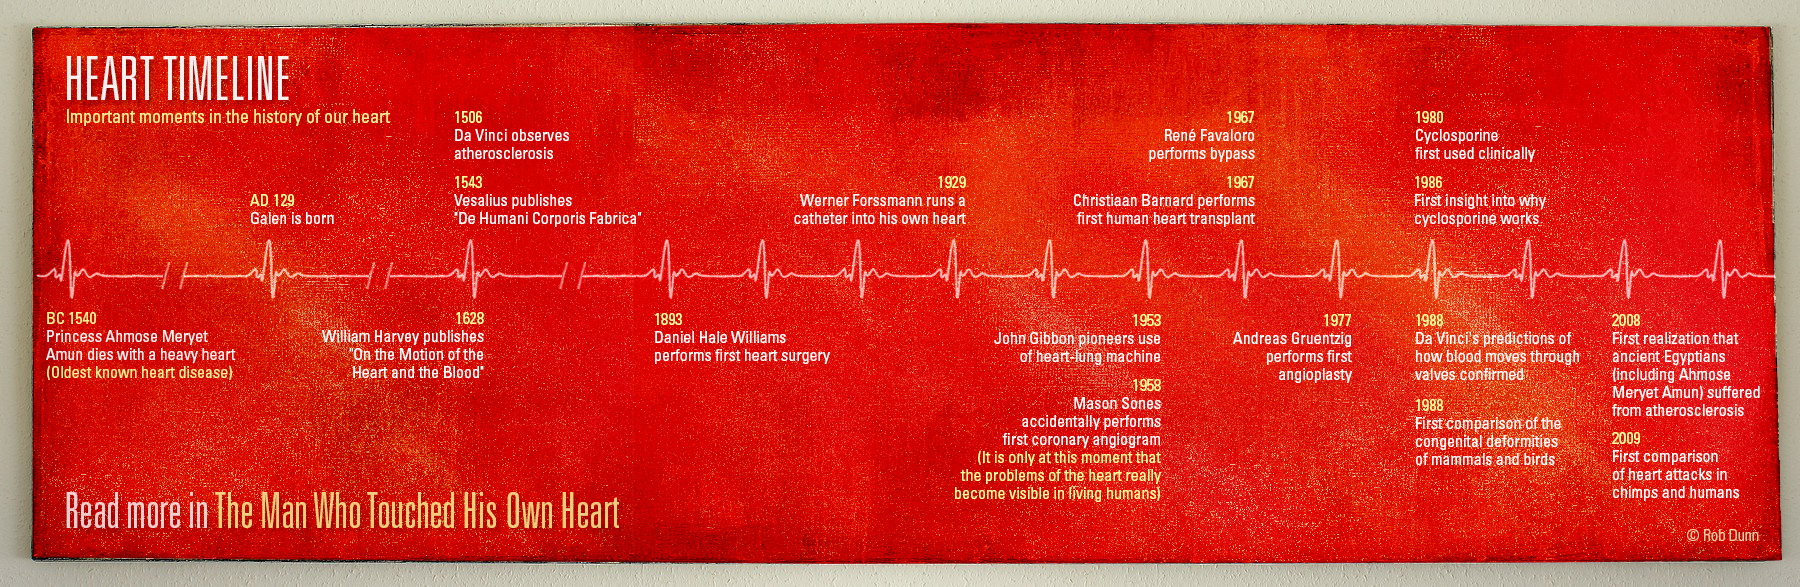 Heart Timeline